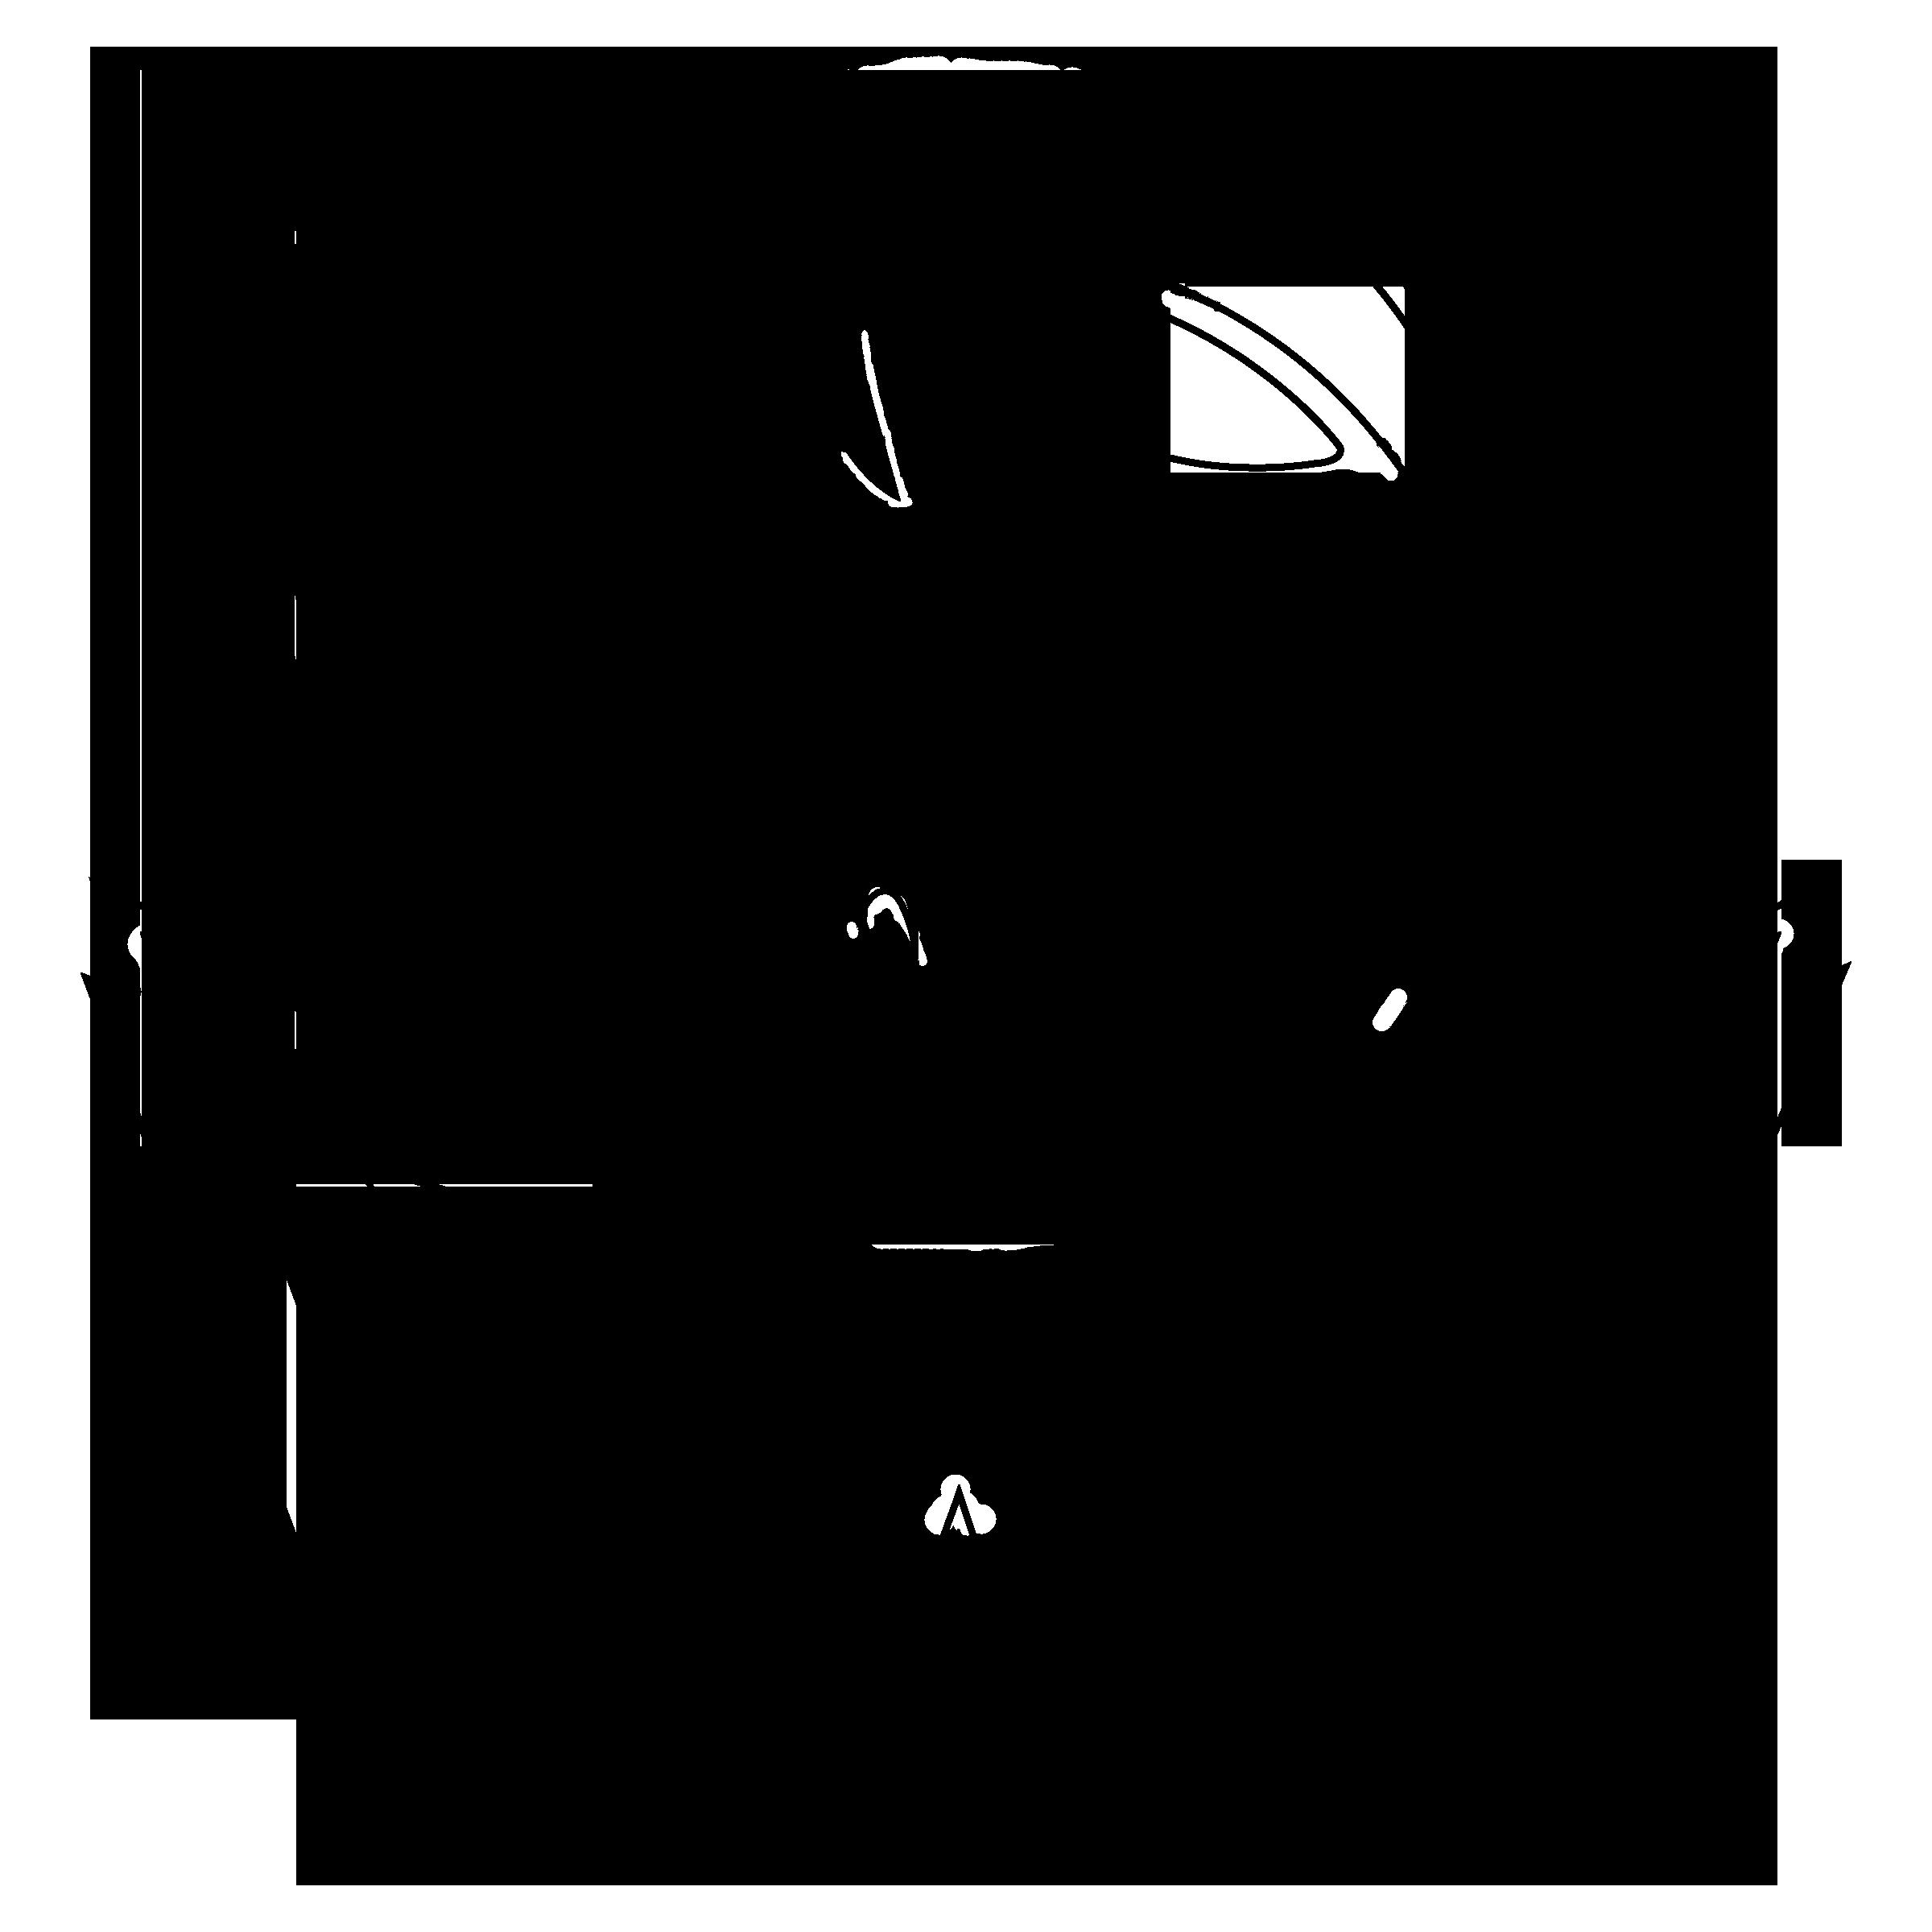 Dallas Mavericks Logo Png Transparent Svg Vector Freebie Supply